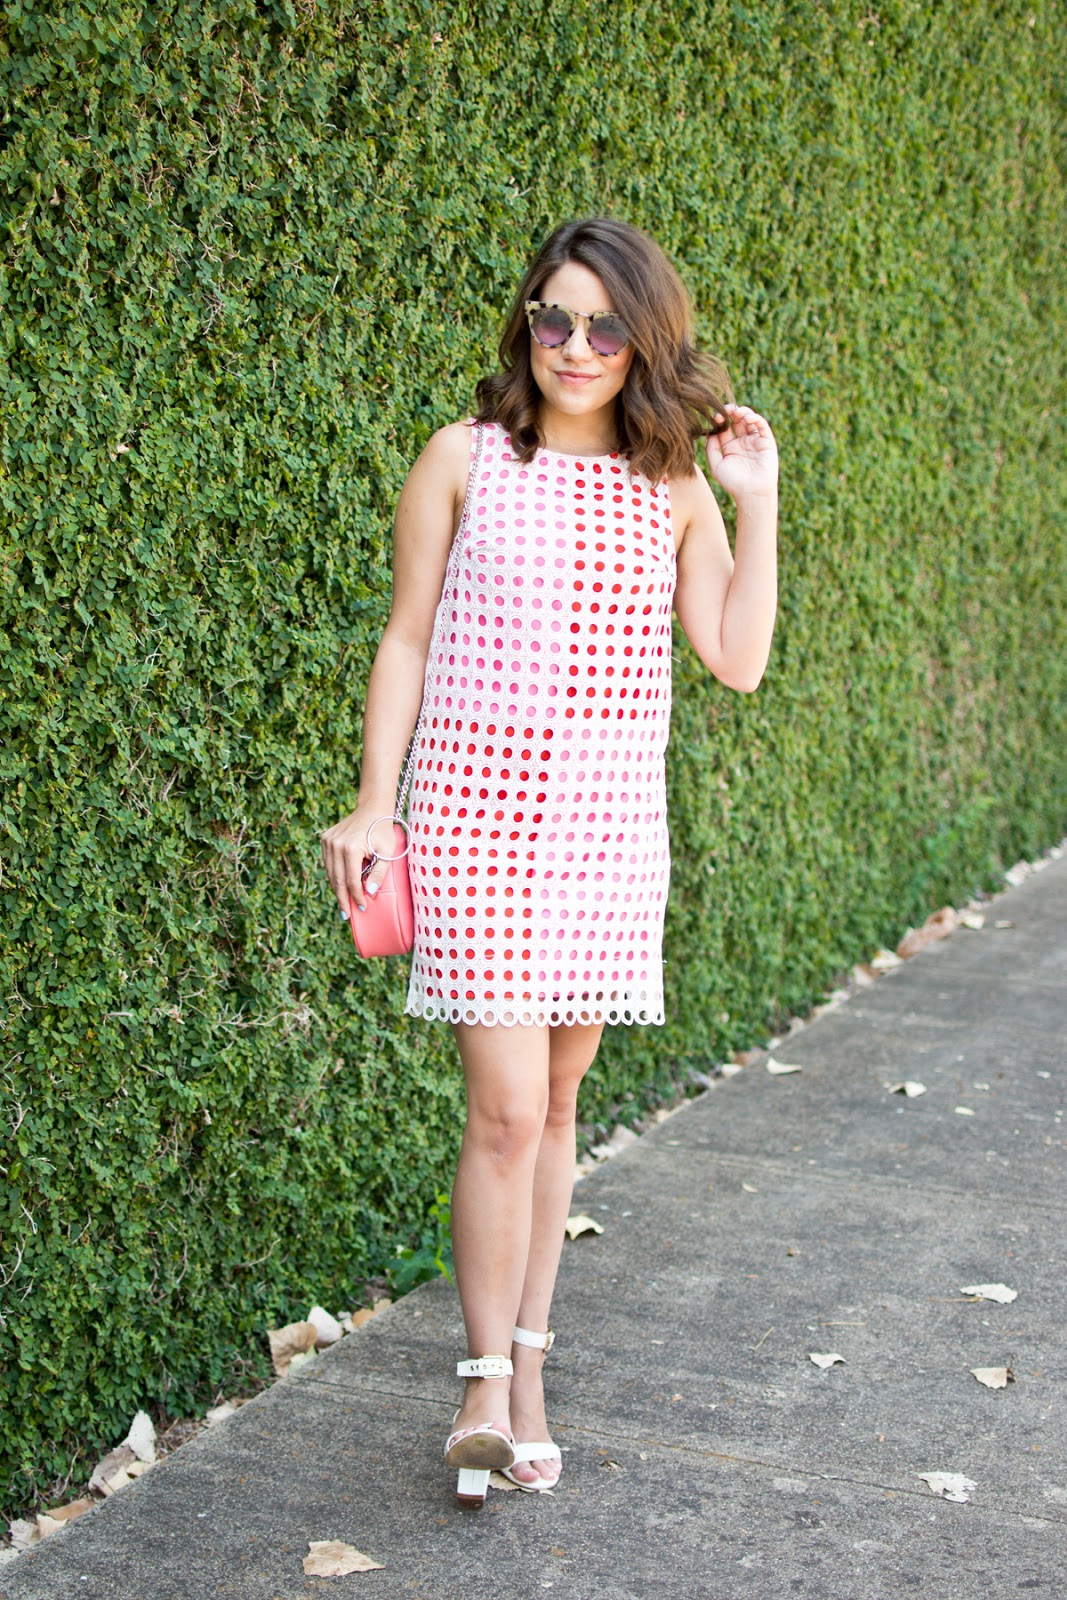 retro shift dress modcloth, geometric pink bag, tortoiseshell sunglasses, white block heels